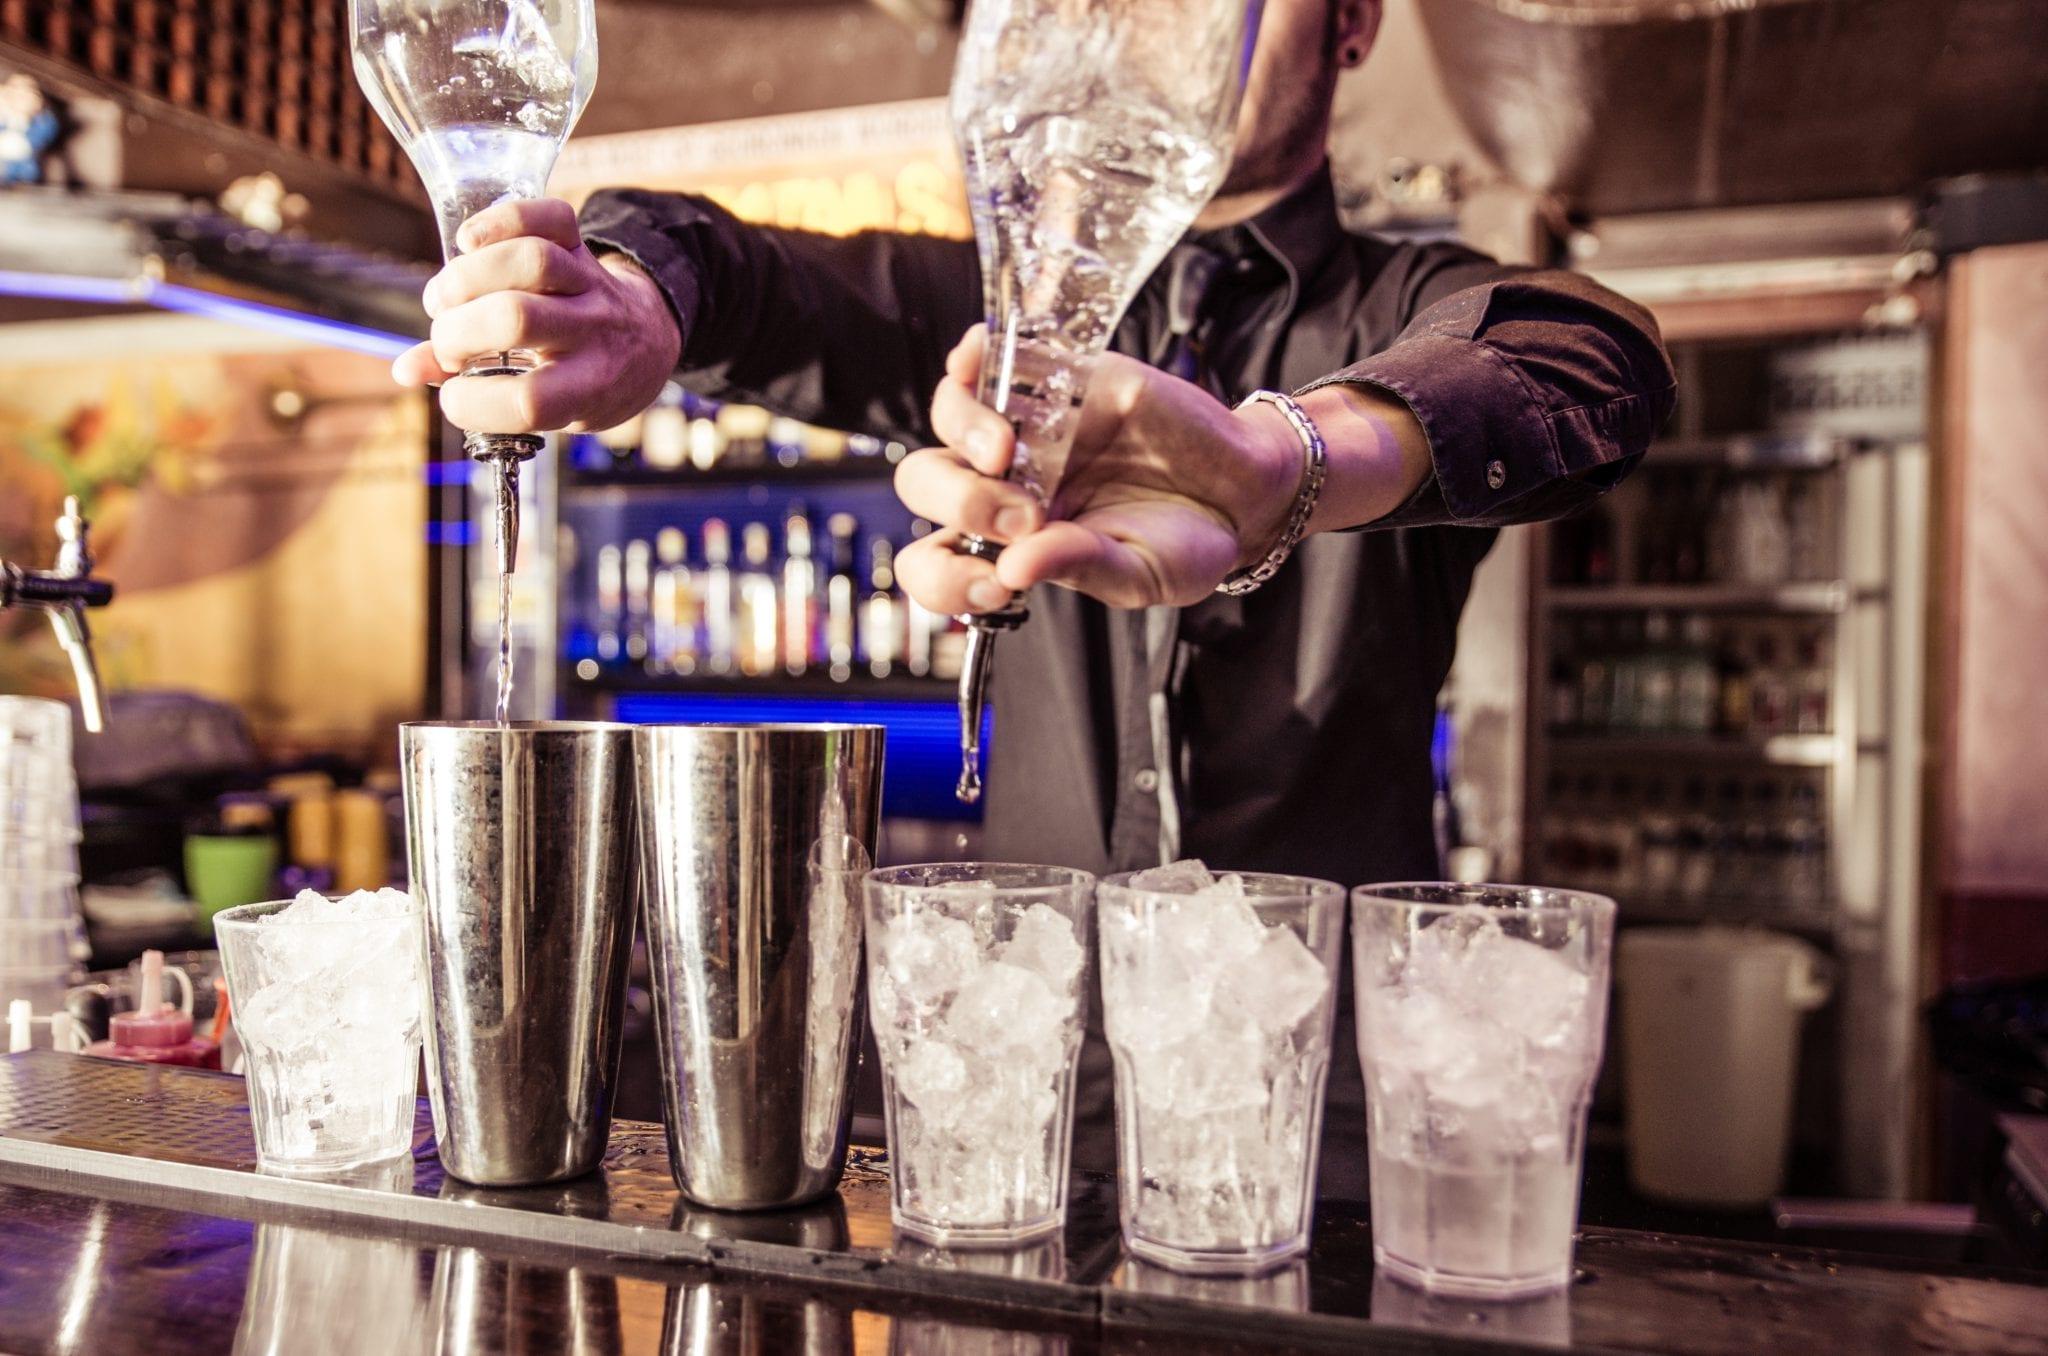 Hyr en bartender